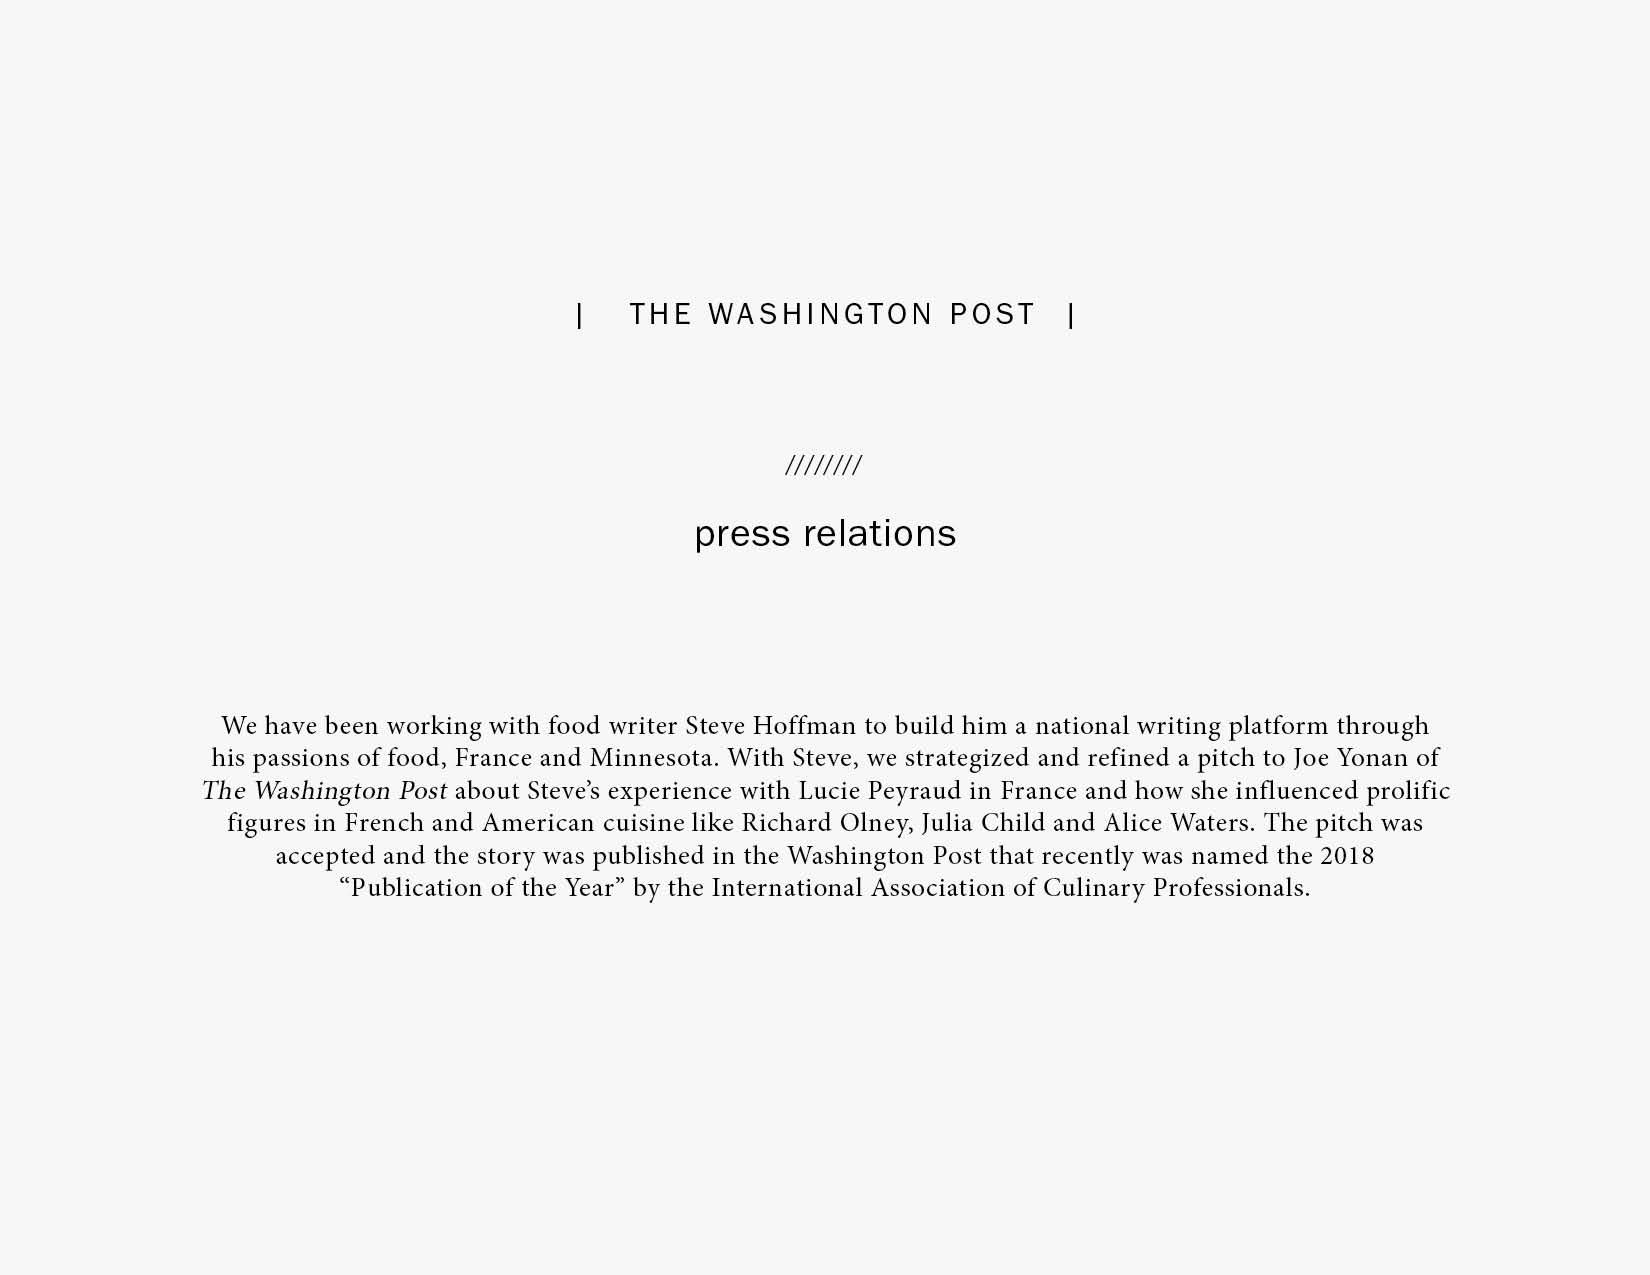 WASH_POST_HOFFMAN2.jpg